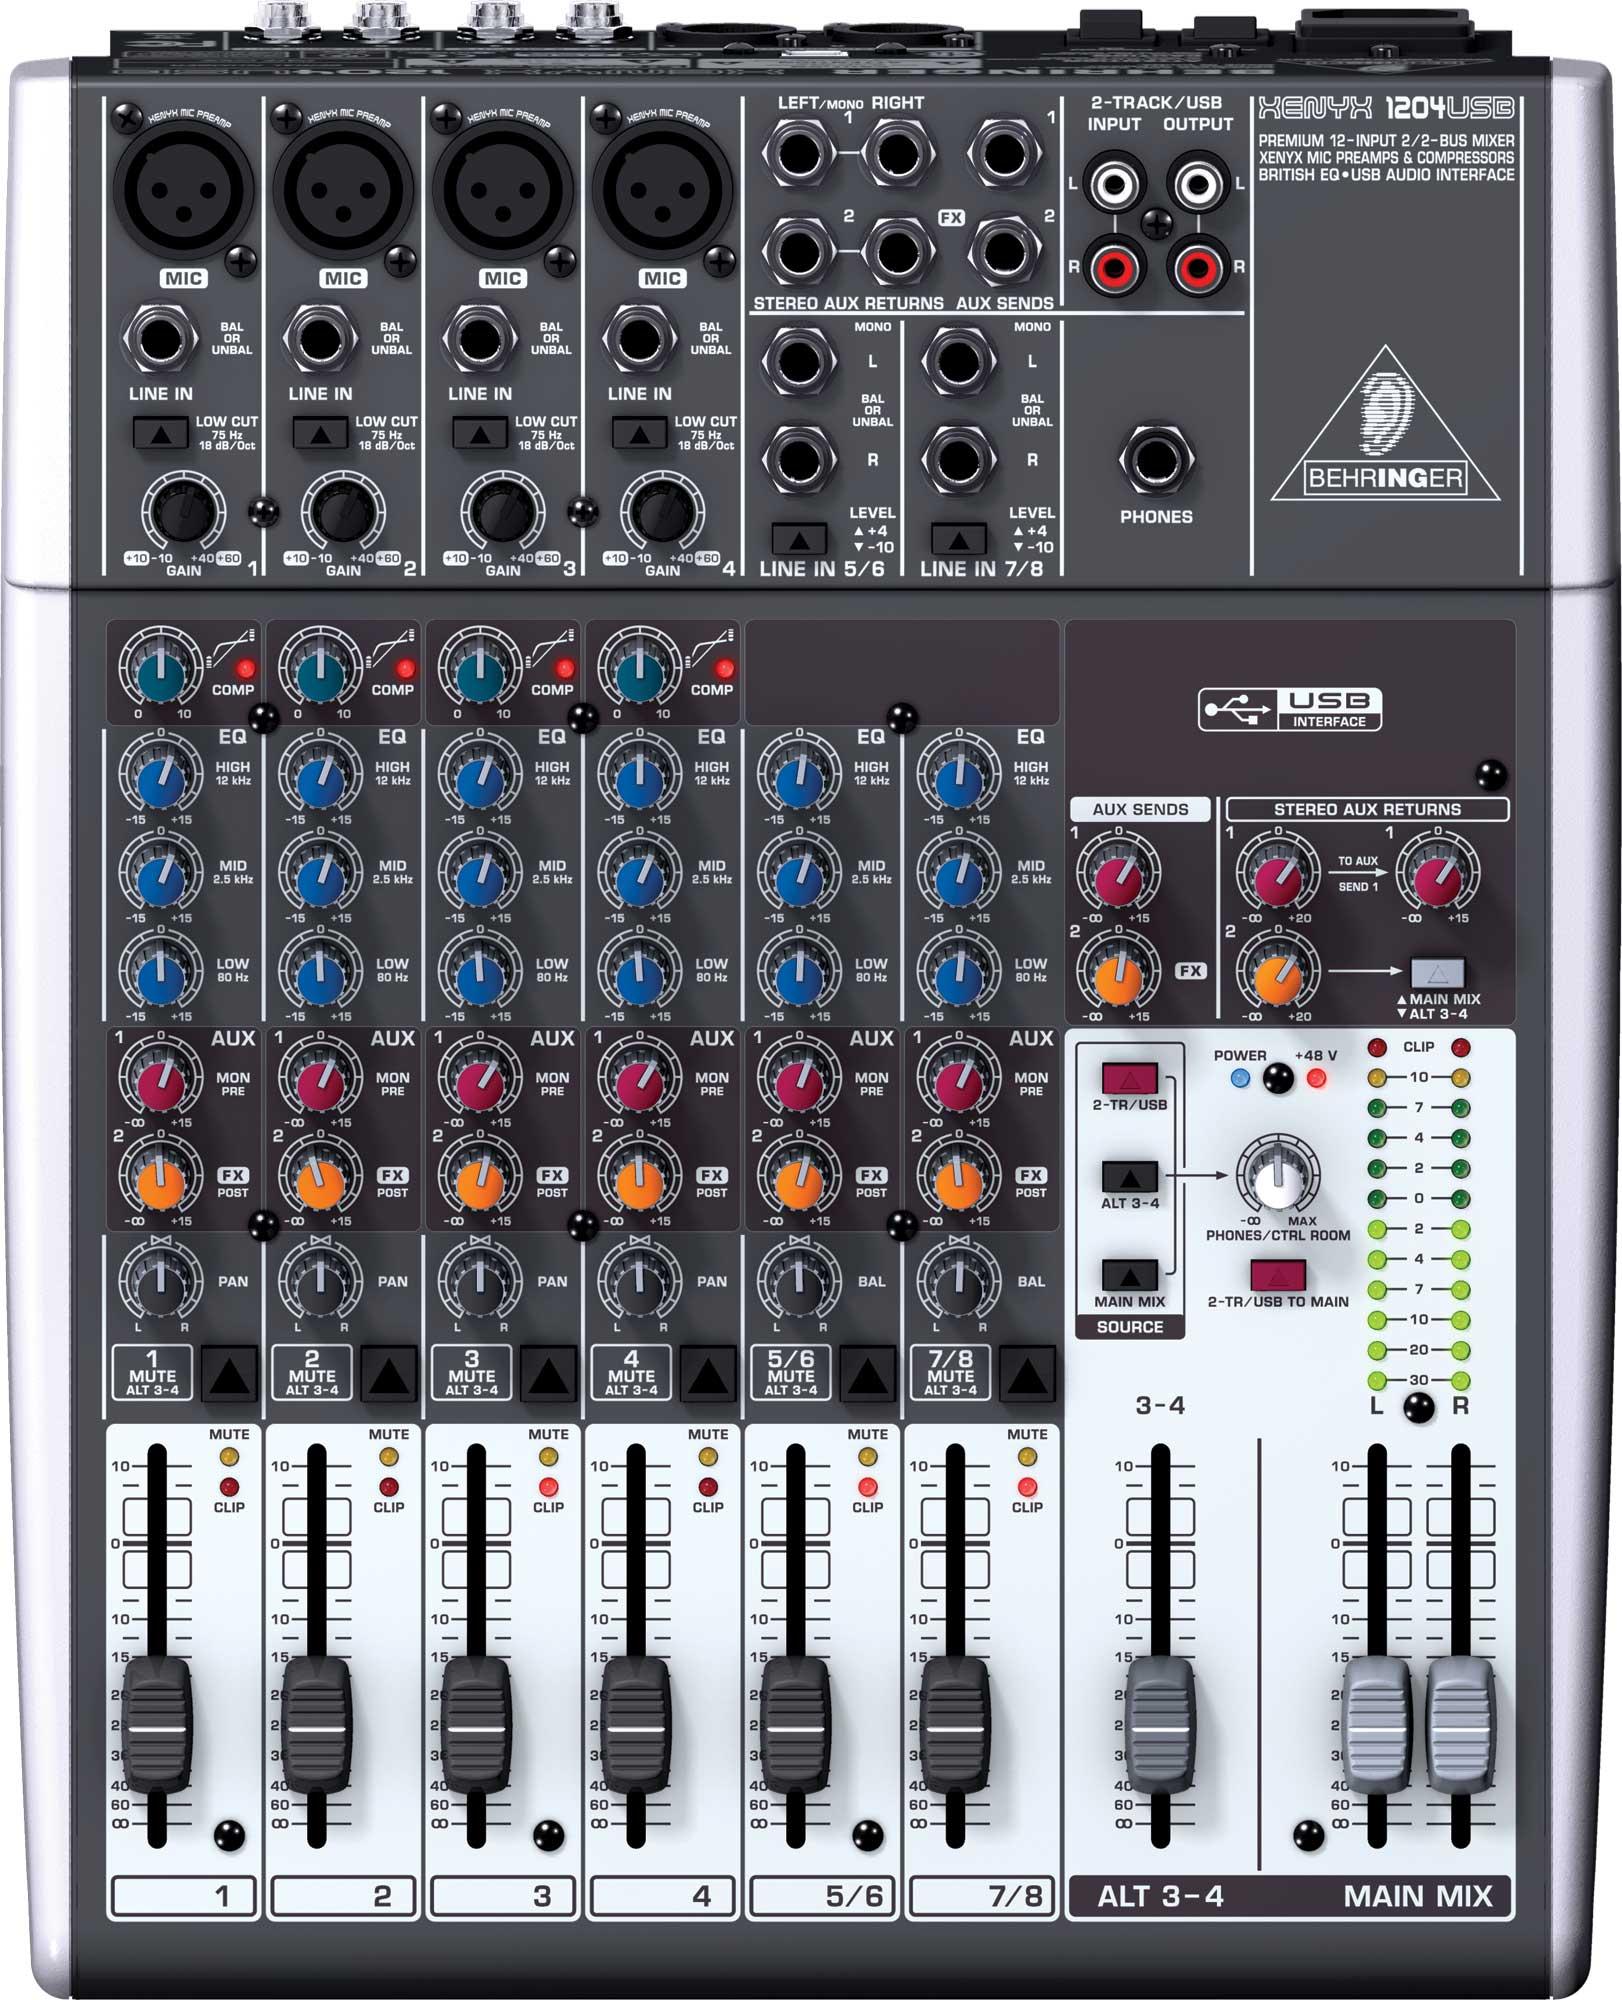 Mixer, 12 Input, 2/2 Bus, USB, energyXT2.5 Software